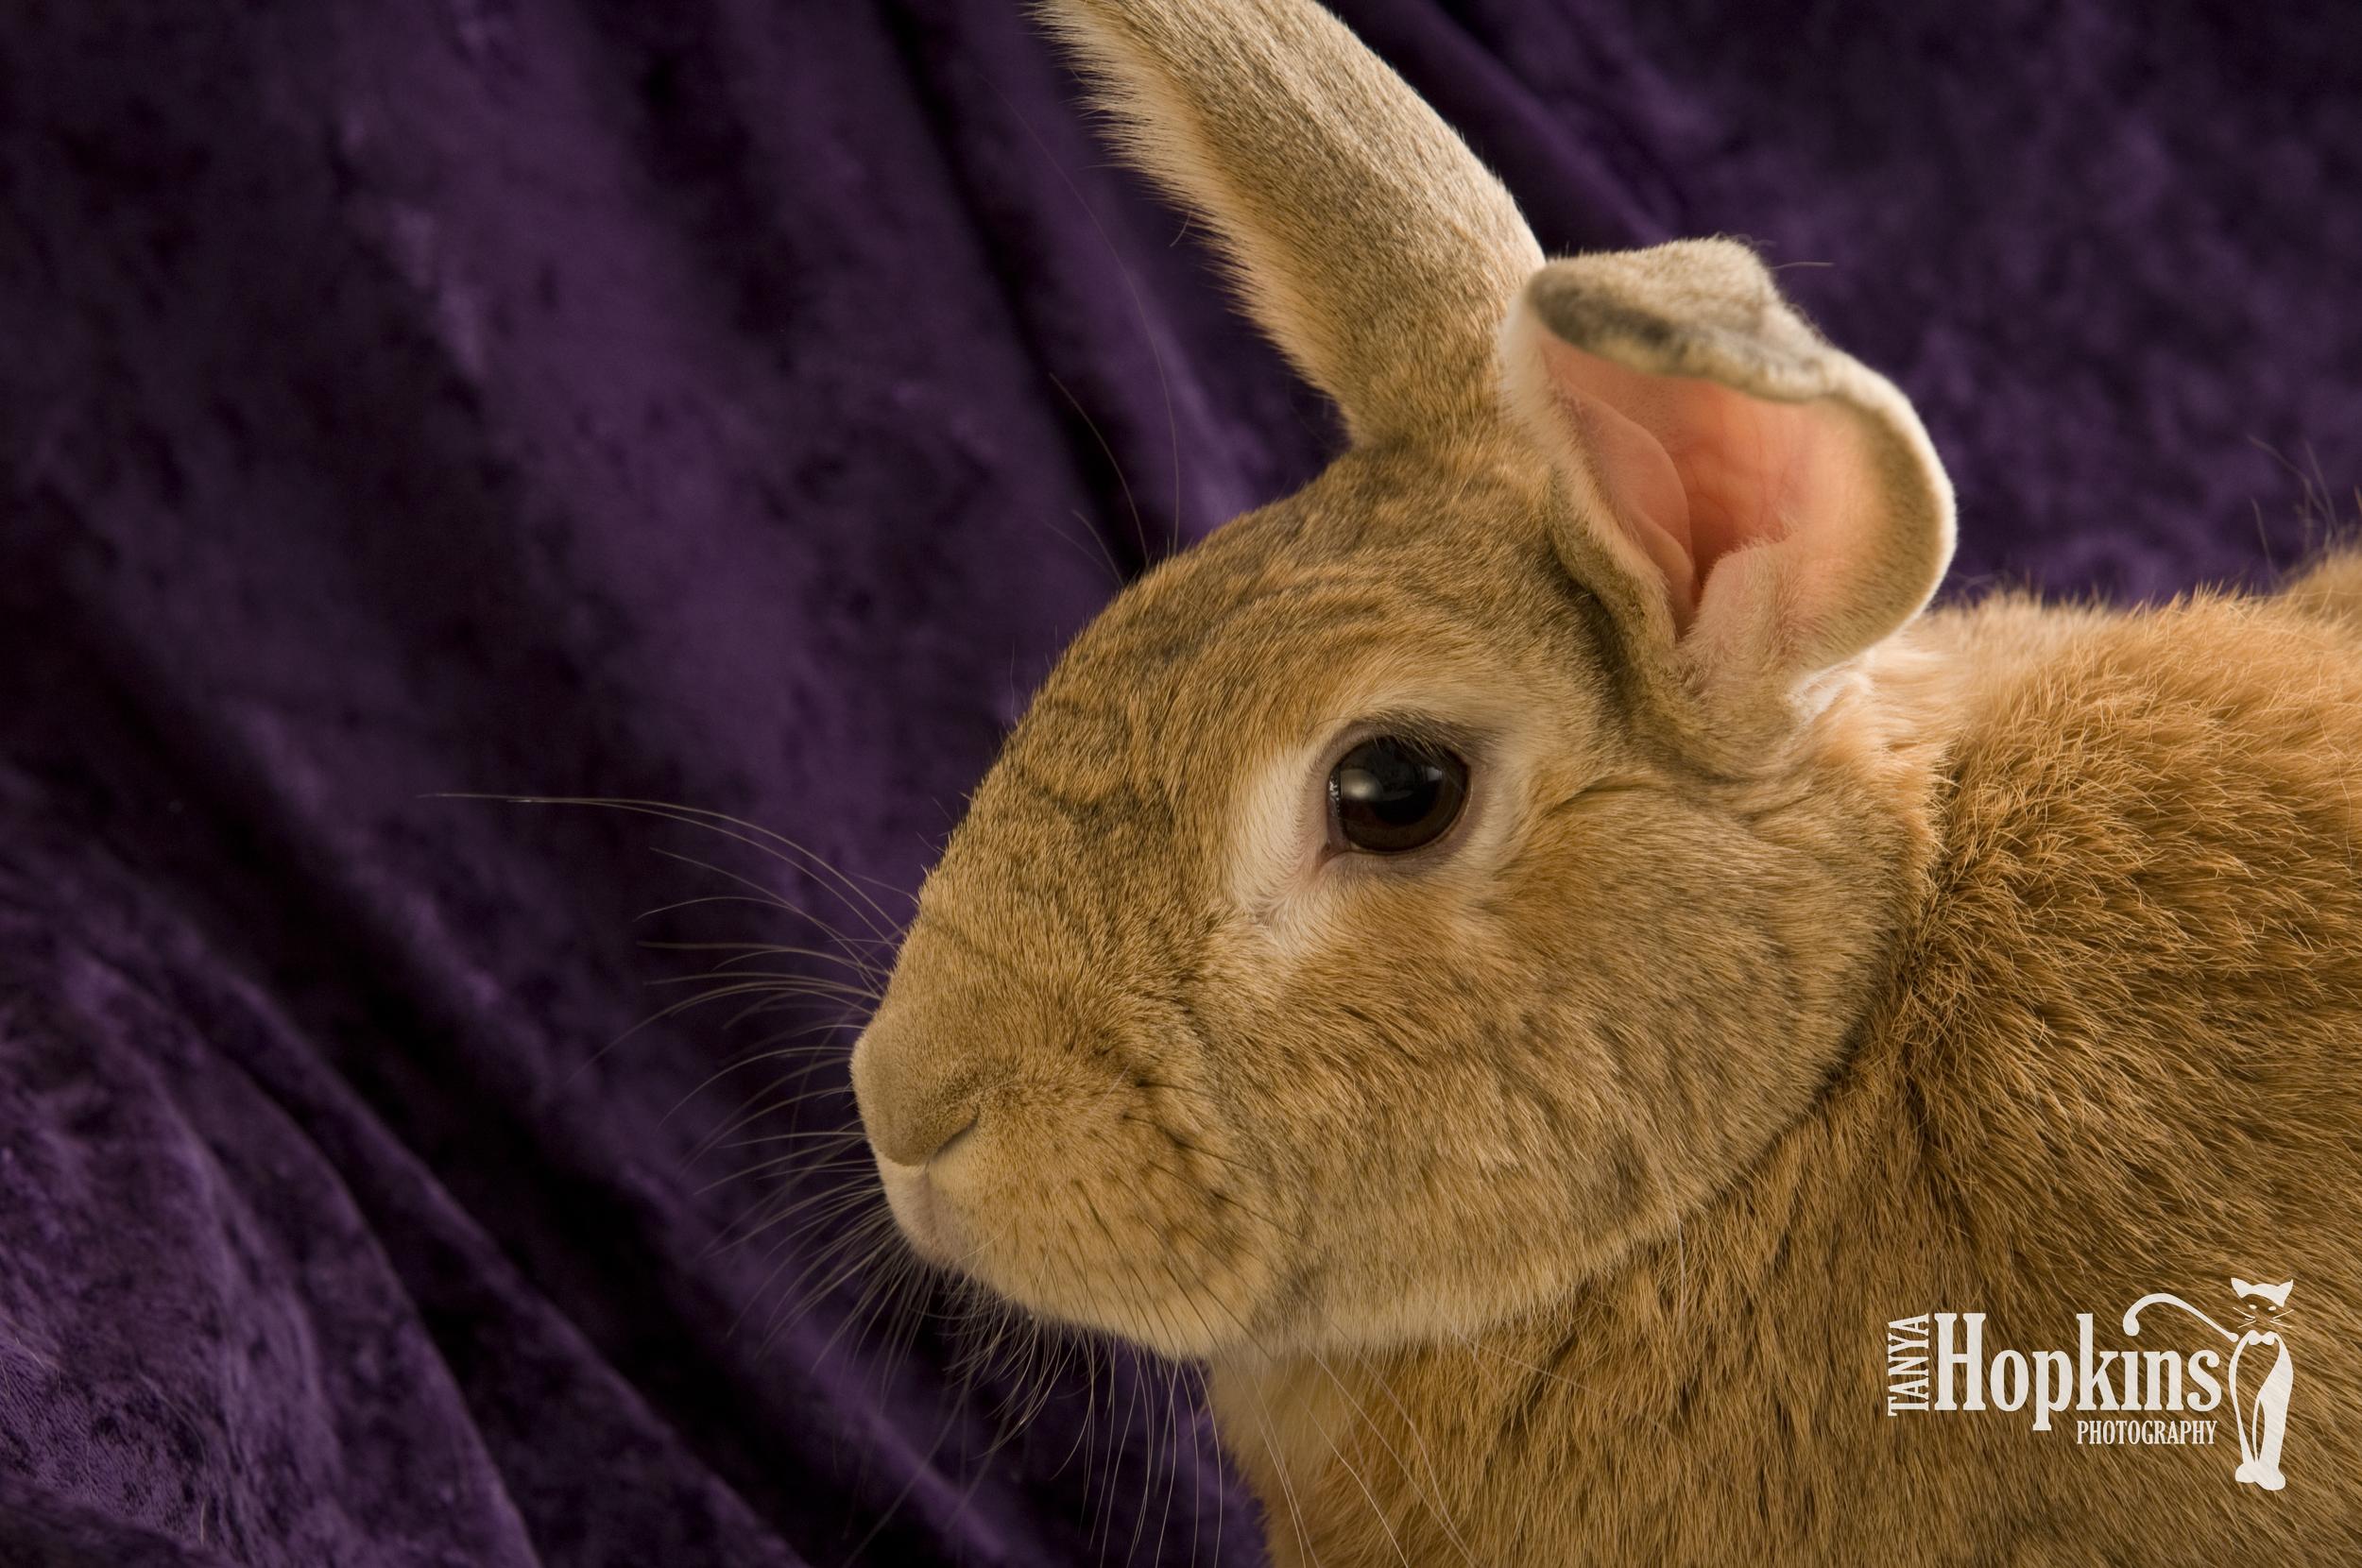 Flemish_Giant_Rabbit.jpg